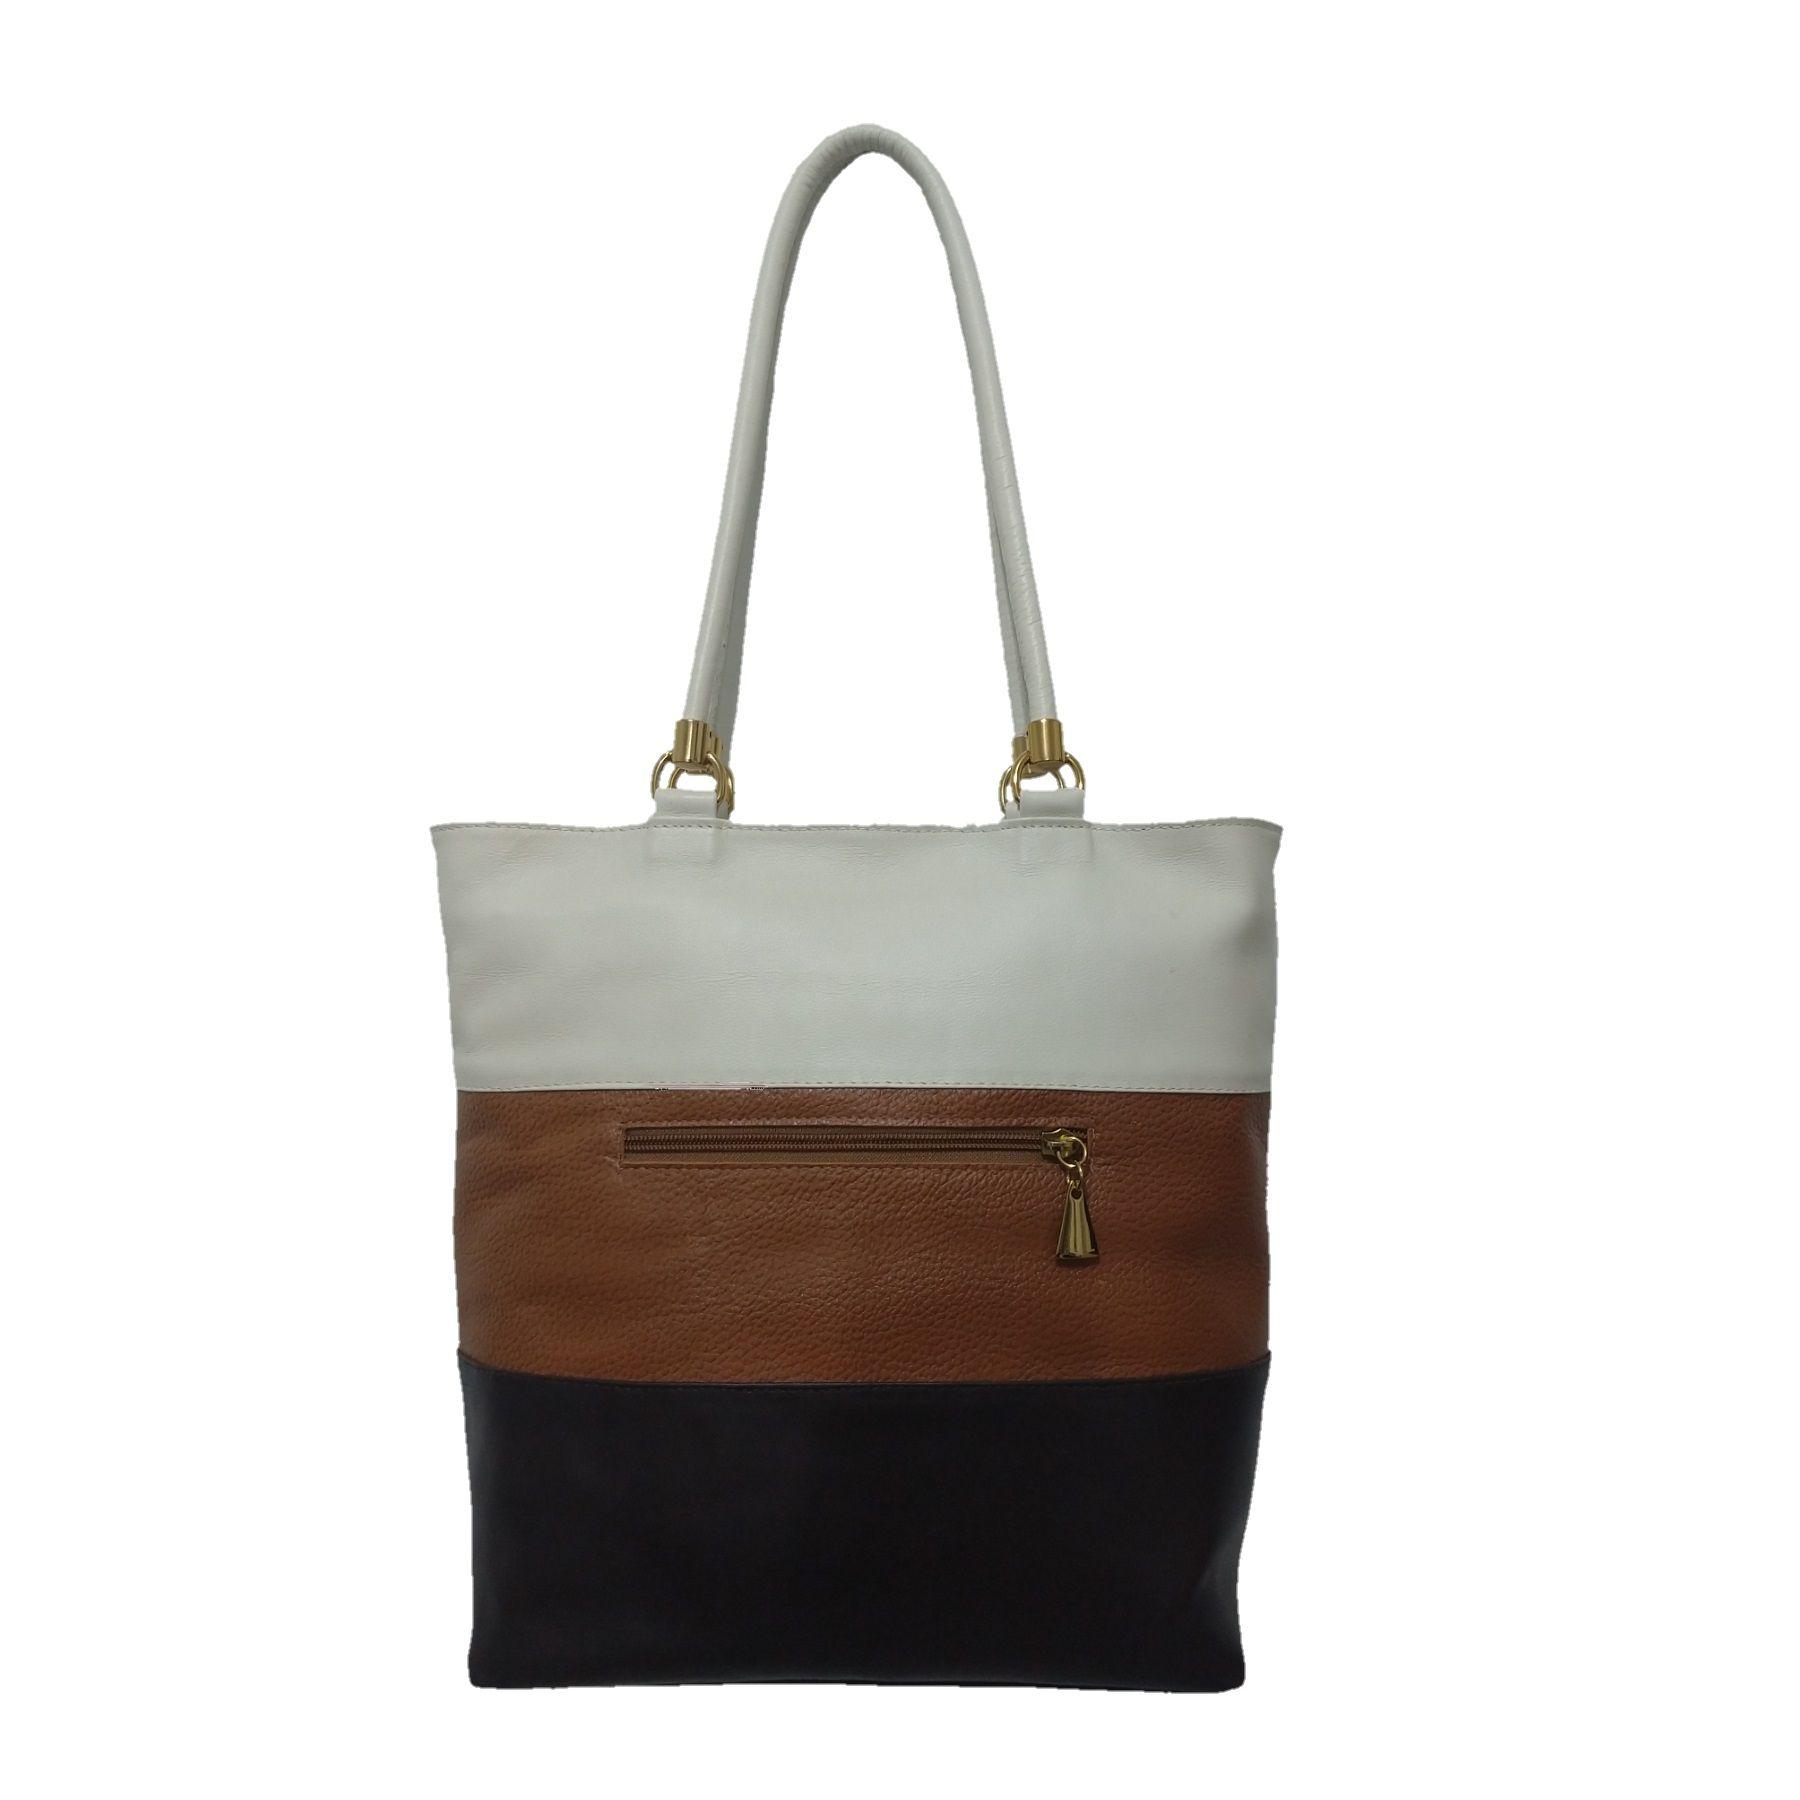 Bolsa Sacola TopGrife Shopper Couro Multicolorido  - SAPATOWEB.COM